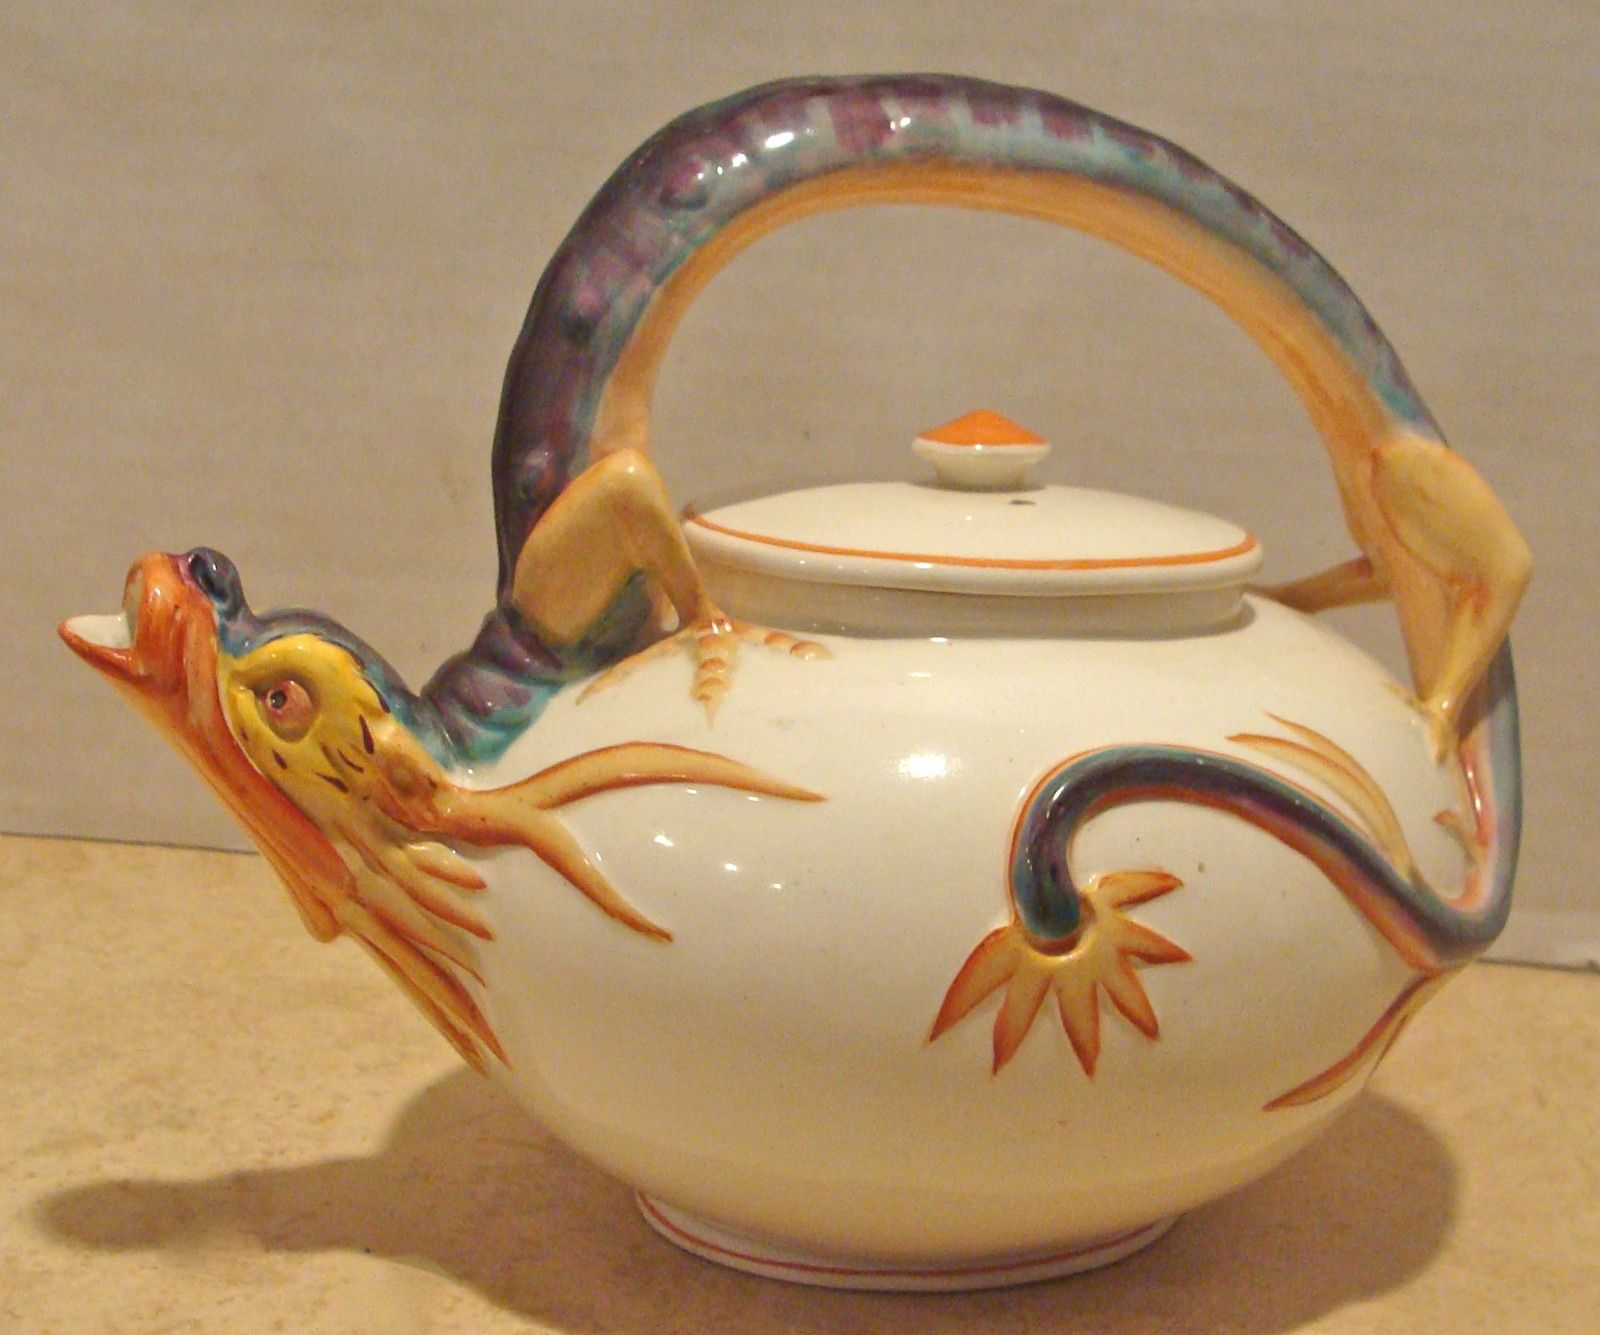 Rare Fantastic Antique 19th Century Wedgwood Majolica Dragon Teapot Tea Pots Novelty Teapots Ceramic Teapots